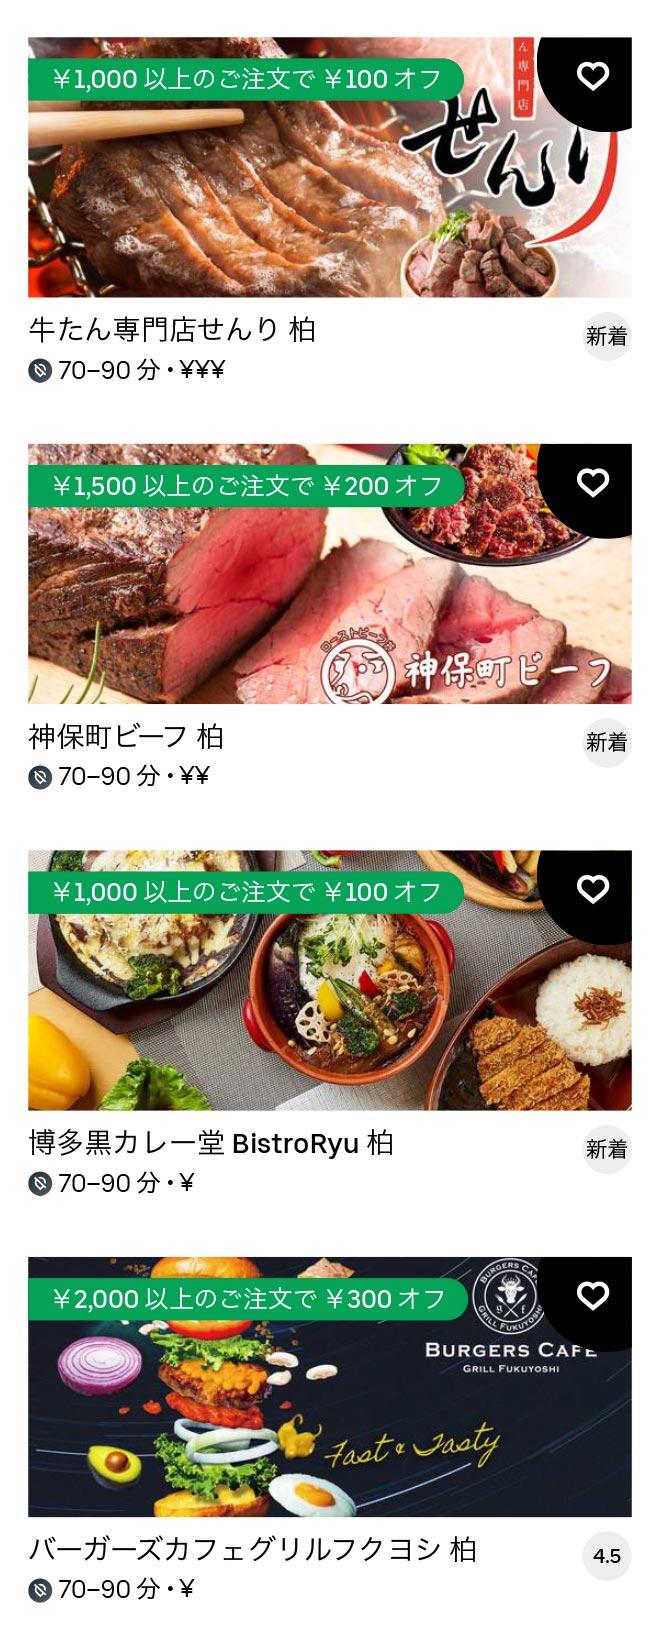 Abiko menu 2011 07